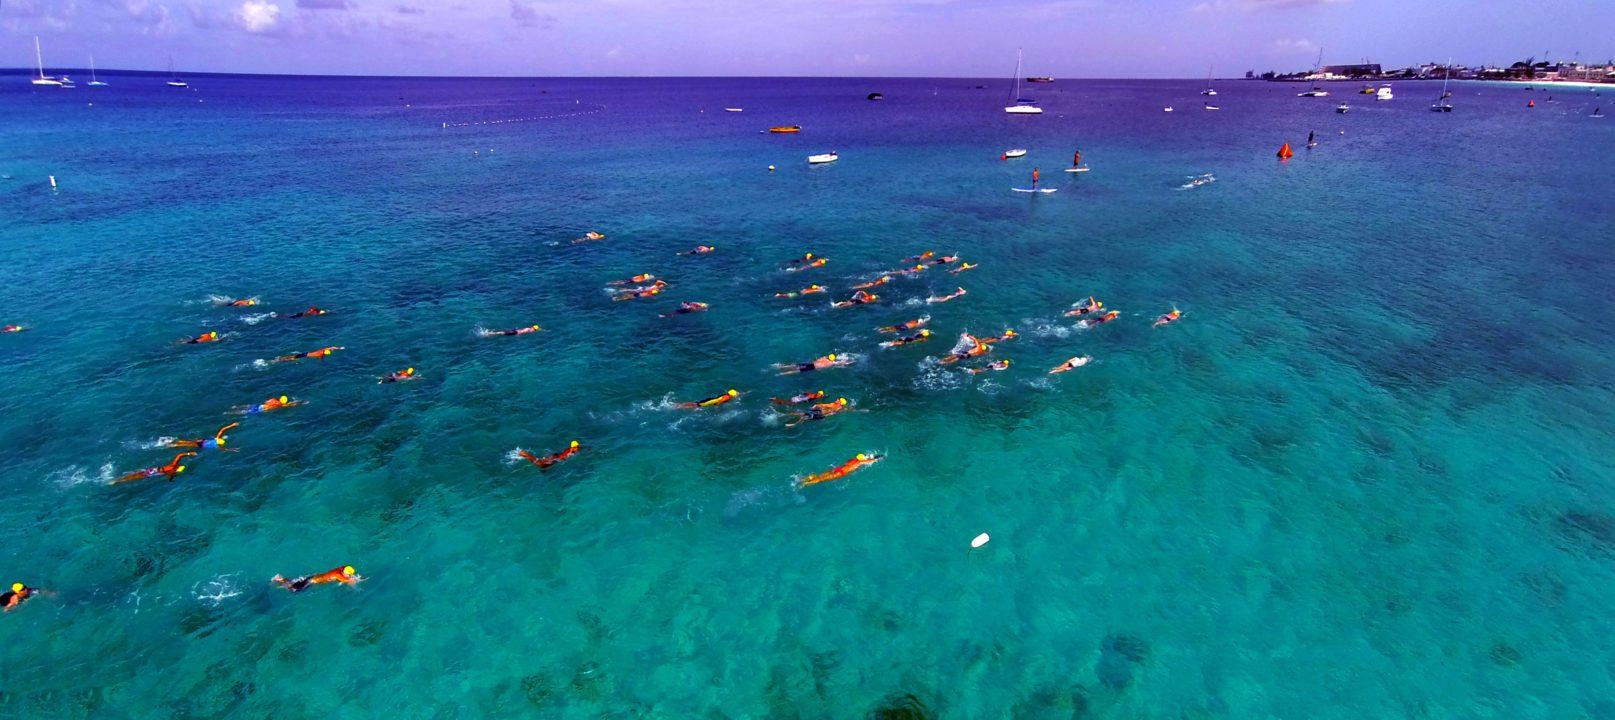 Barbados International Masters Swim Meet kicks off Oct 29-31